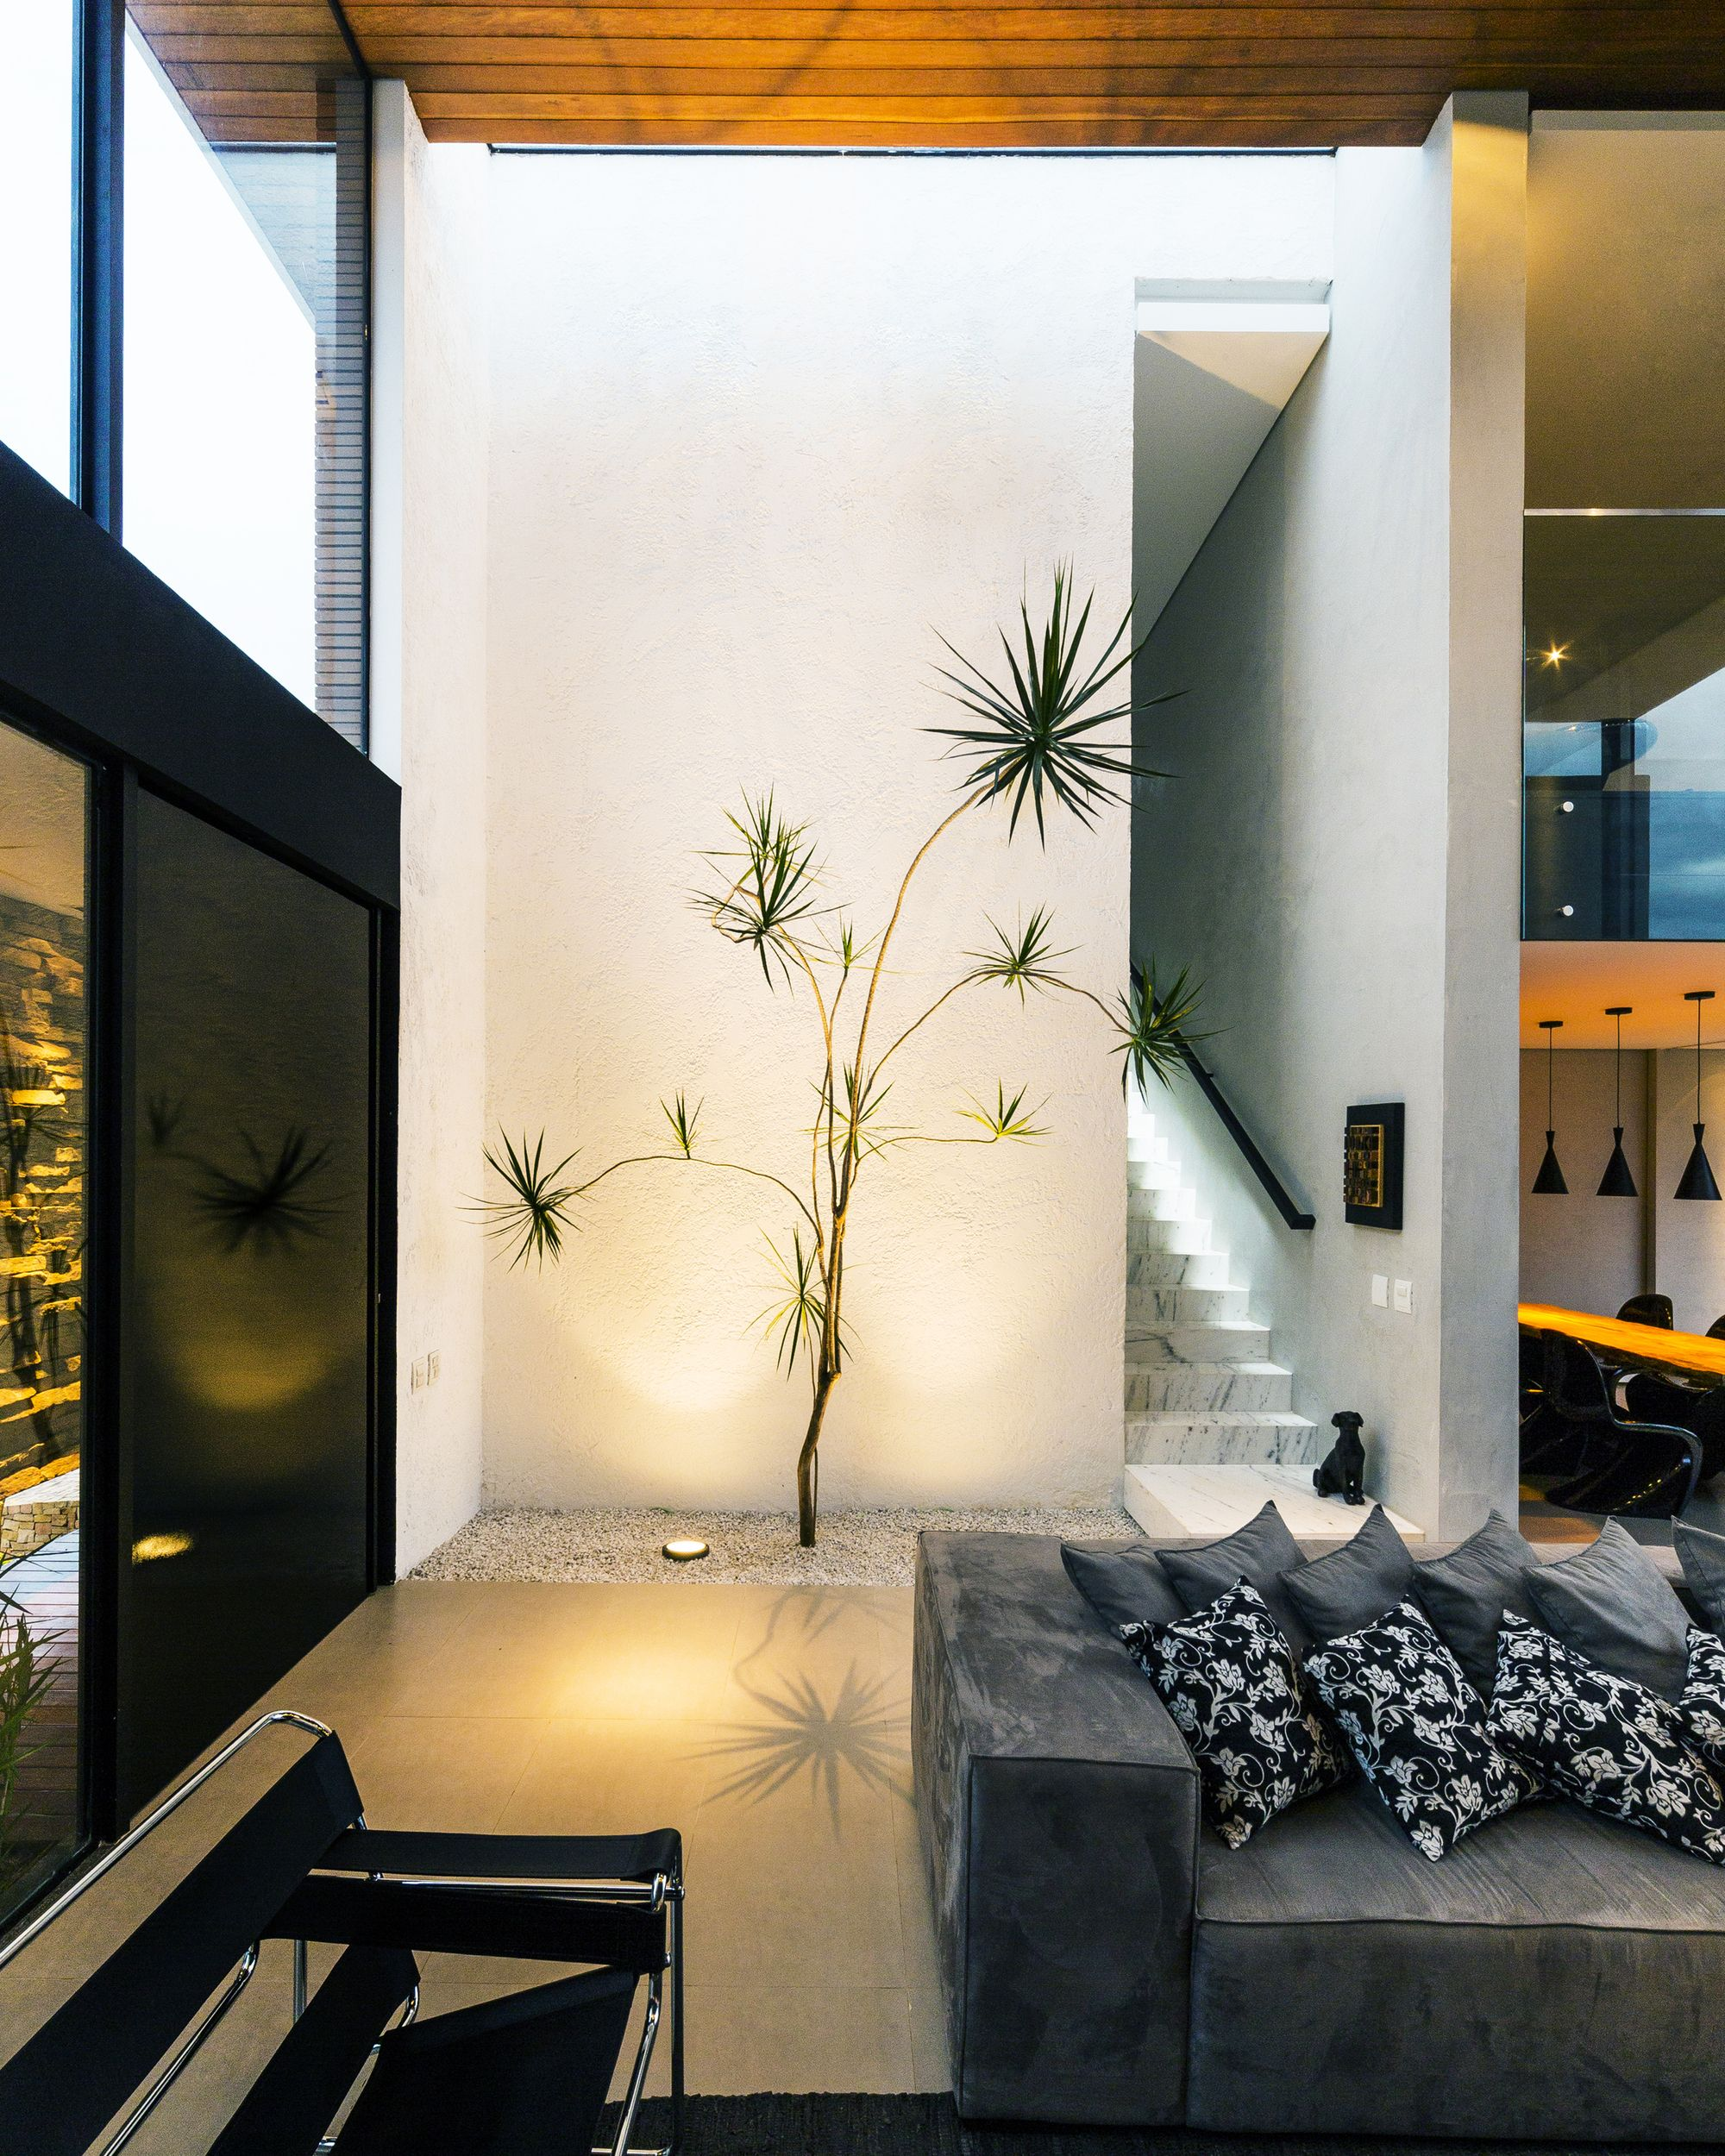 Galer a de casa x11 spagnuolo architecture 12 for Galerias casas minimalistas